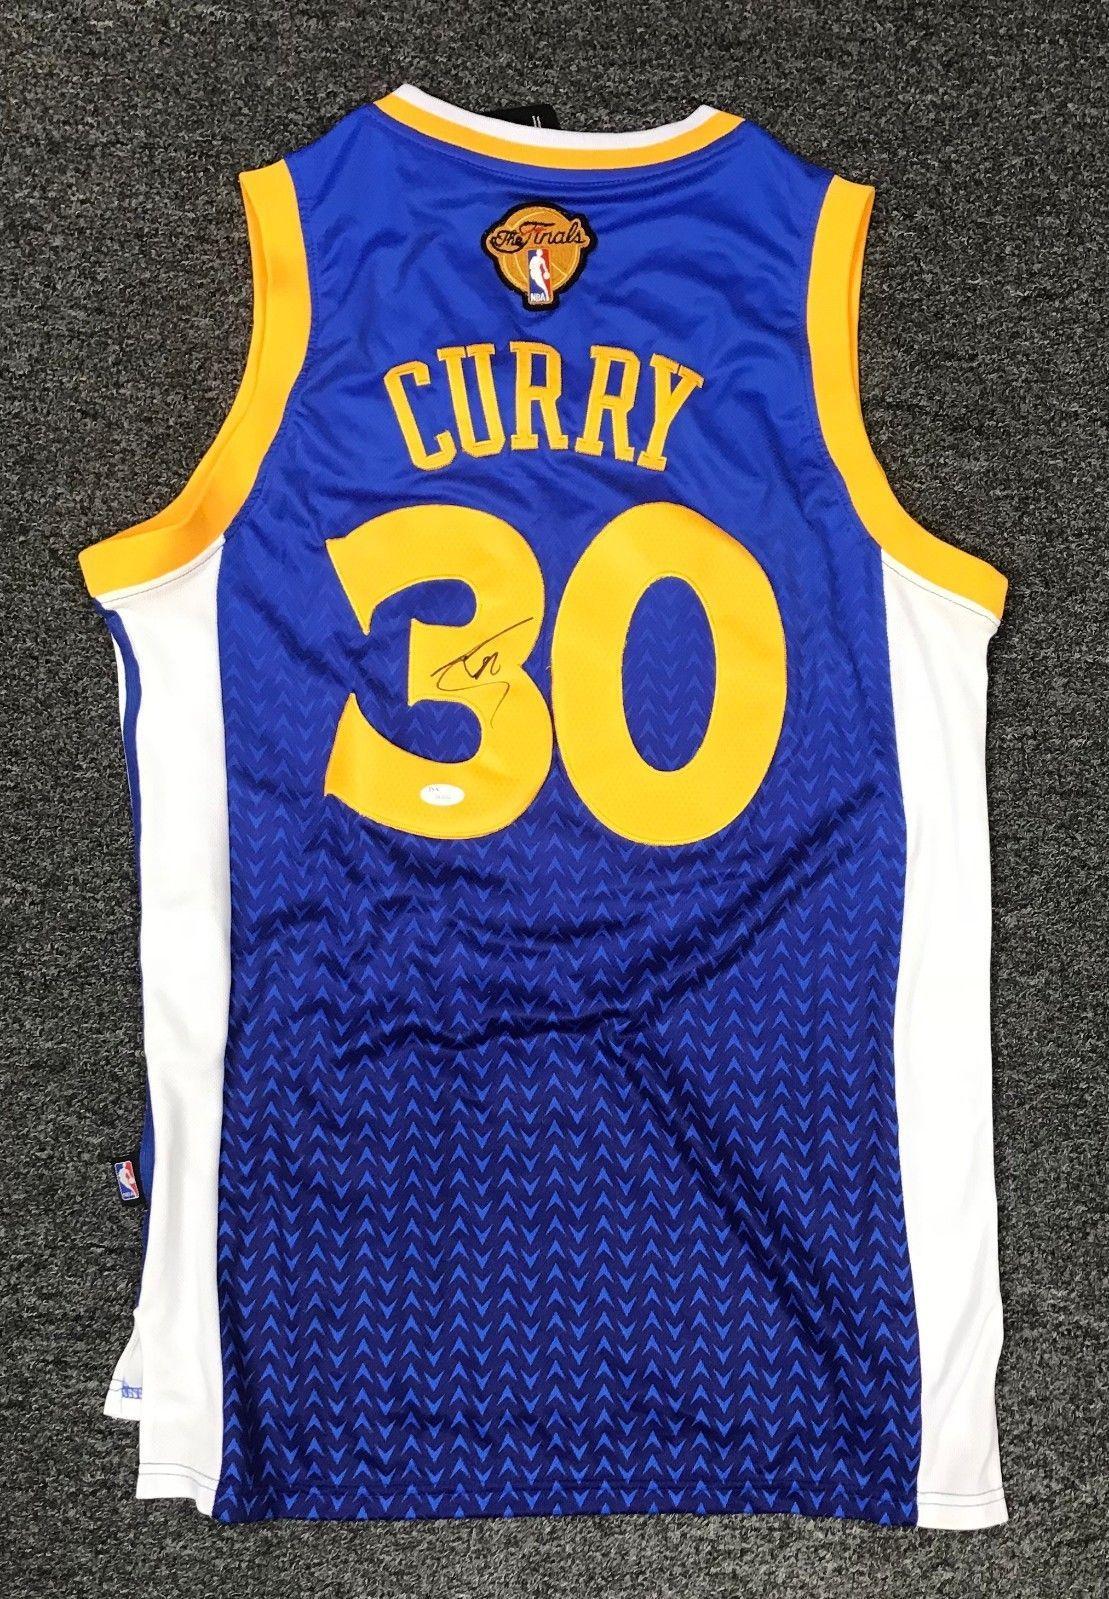 527f8b85309 Stephen Curry  30 Signed Golden State Warriors Jersey Autograph Sz M JSA  LOA  Basketball